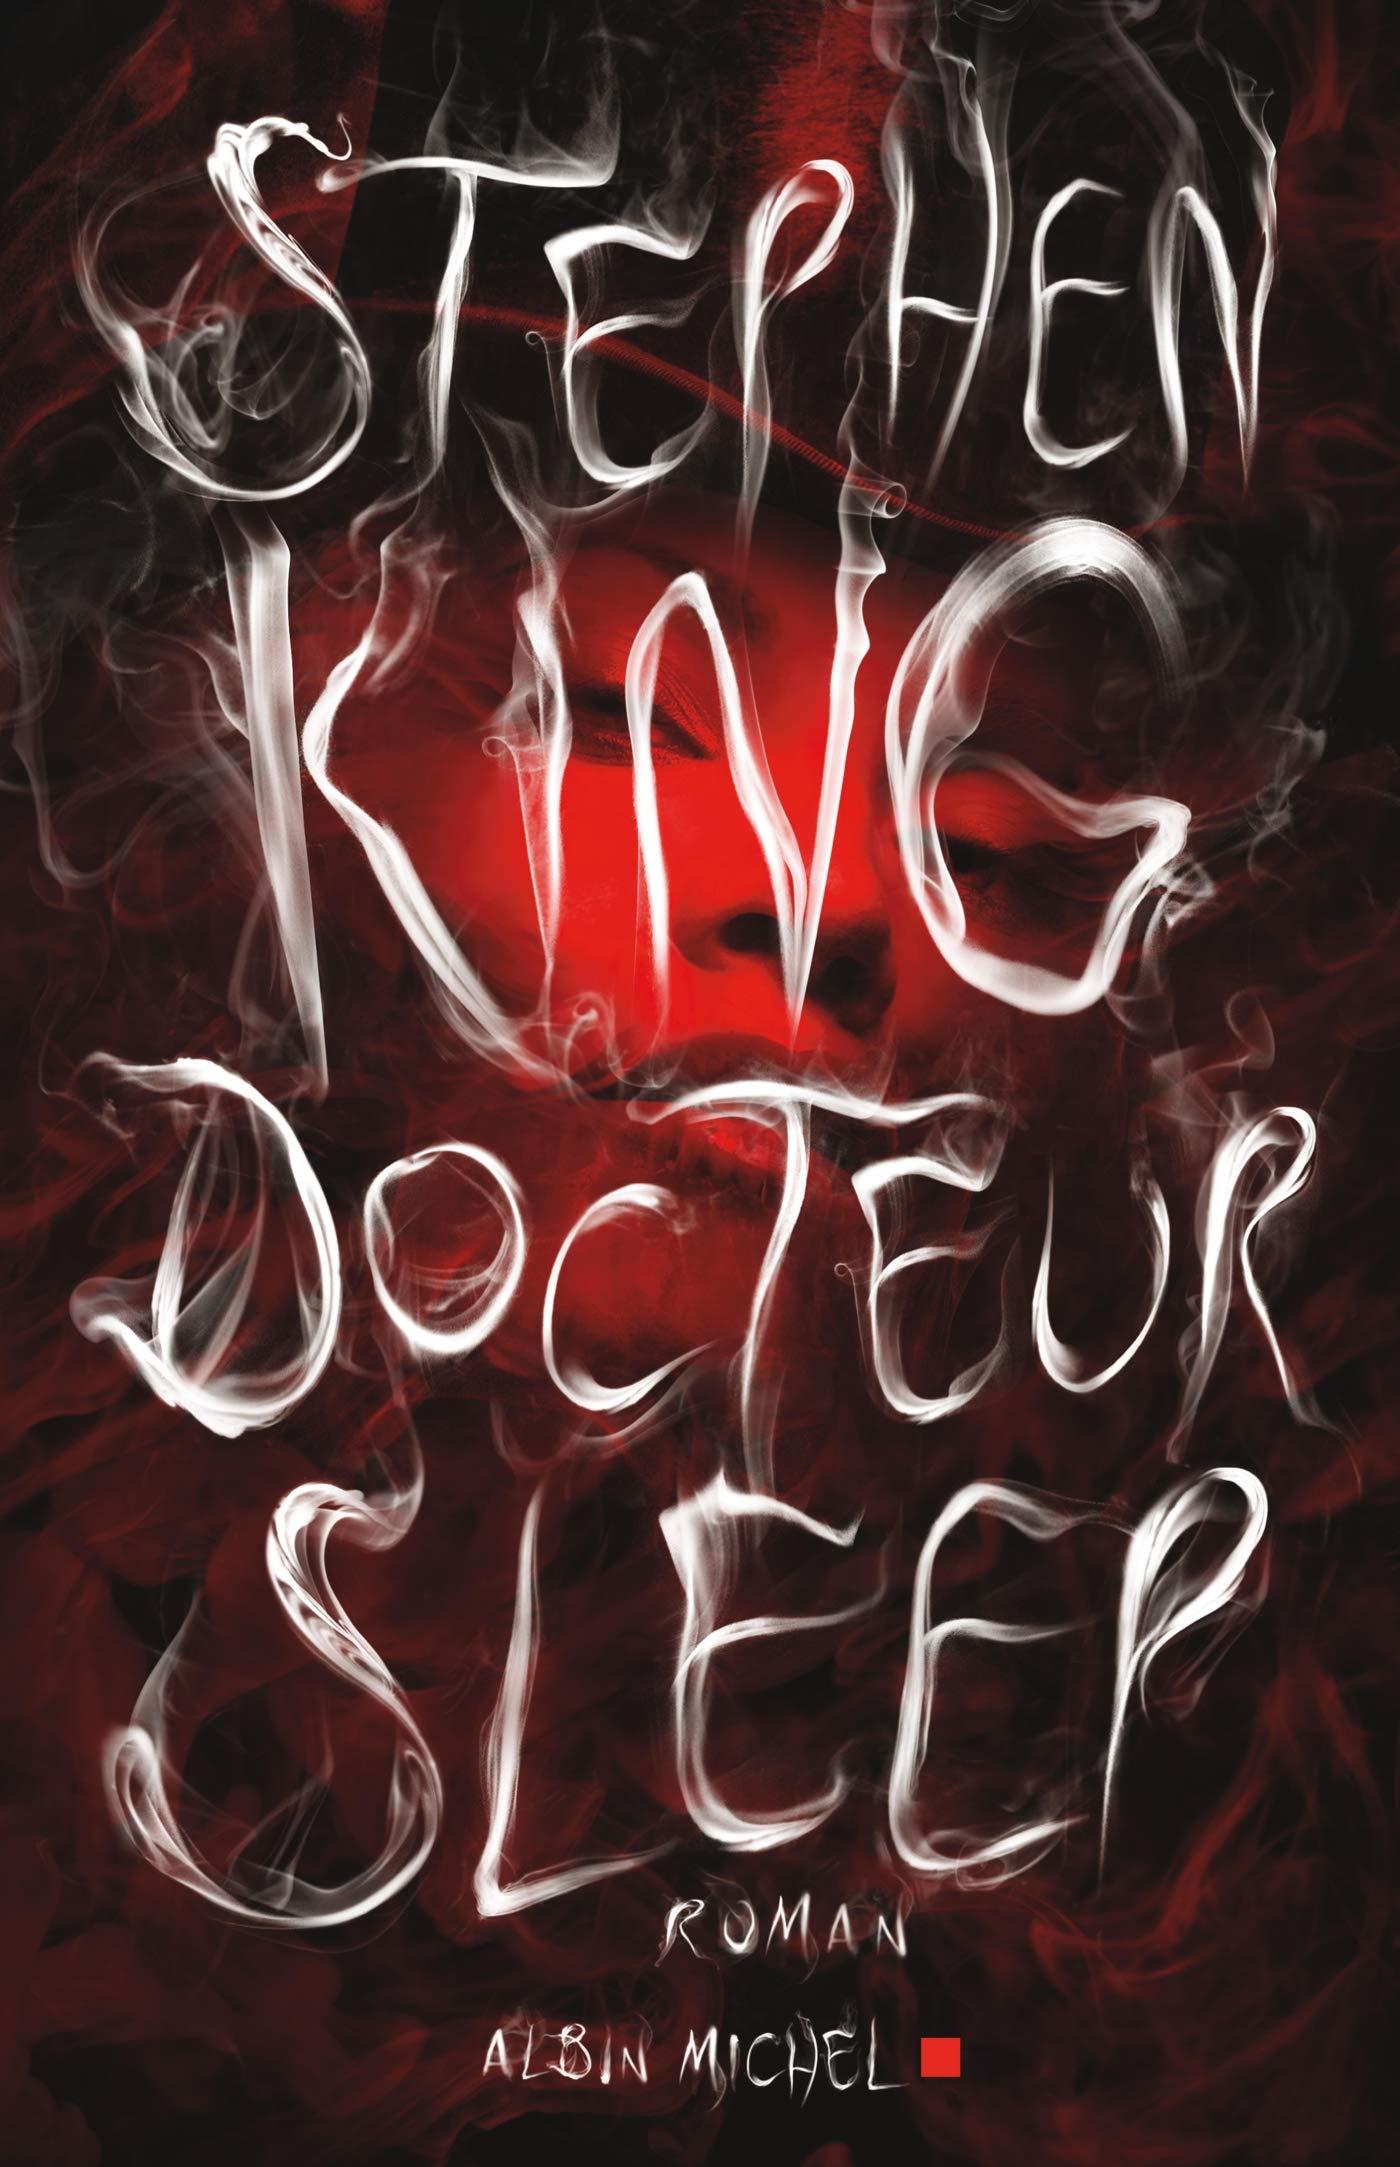 Docteur Sleep, roman